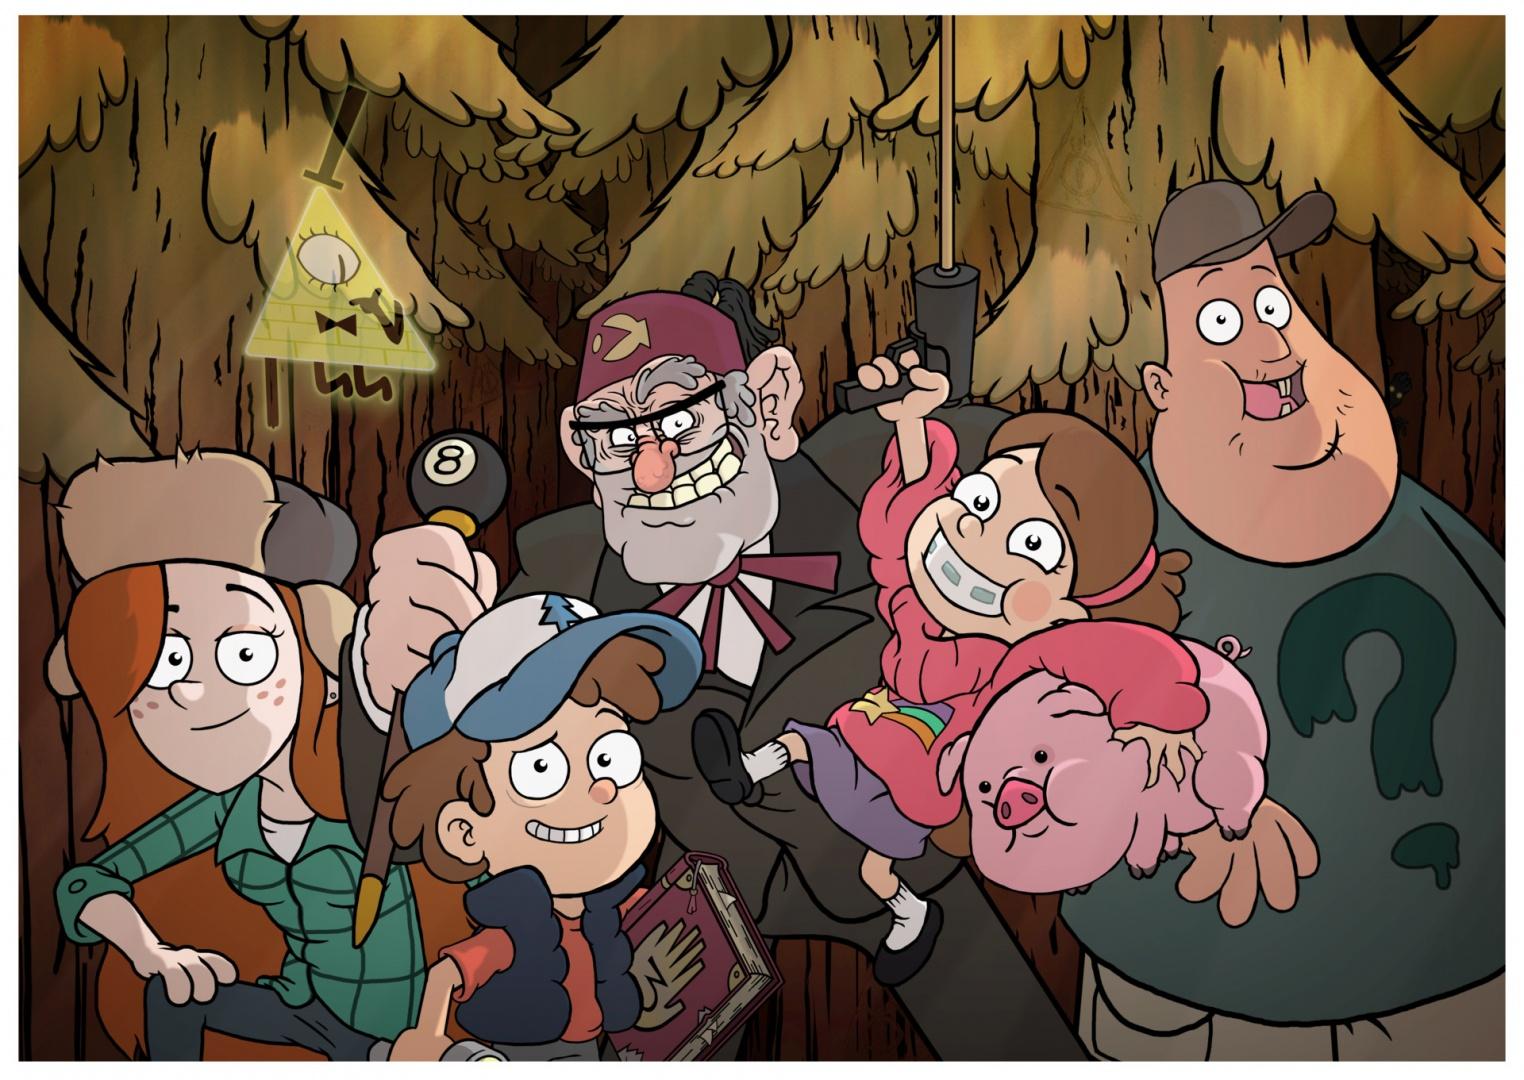 Ver Serie Gravity Falls (2012) Online Completa HD Seriesflix